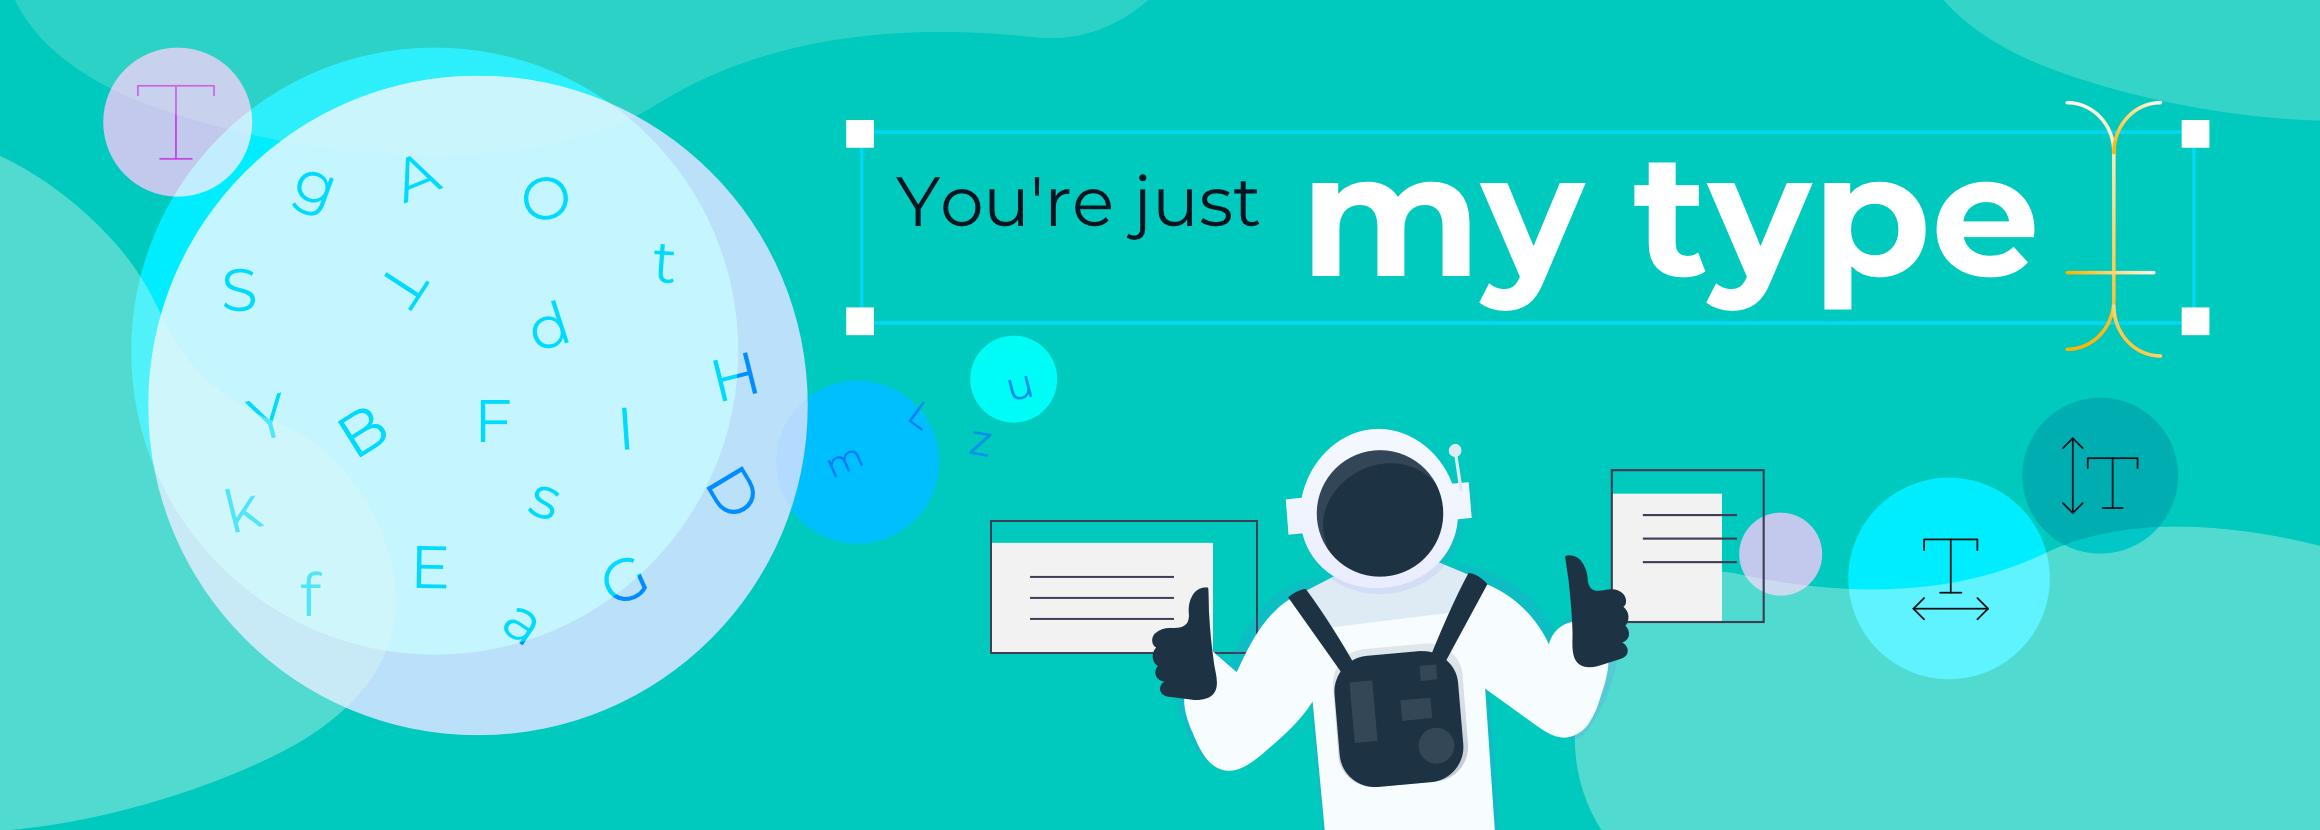 mytype UI/UX series #3